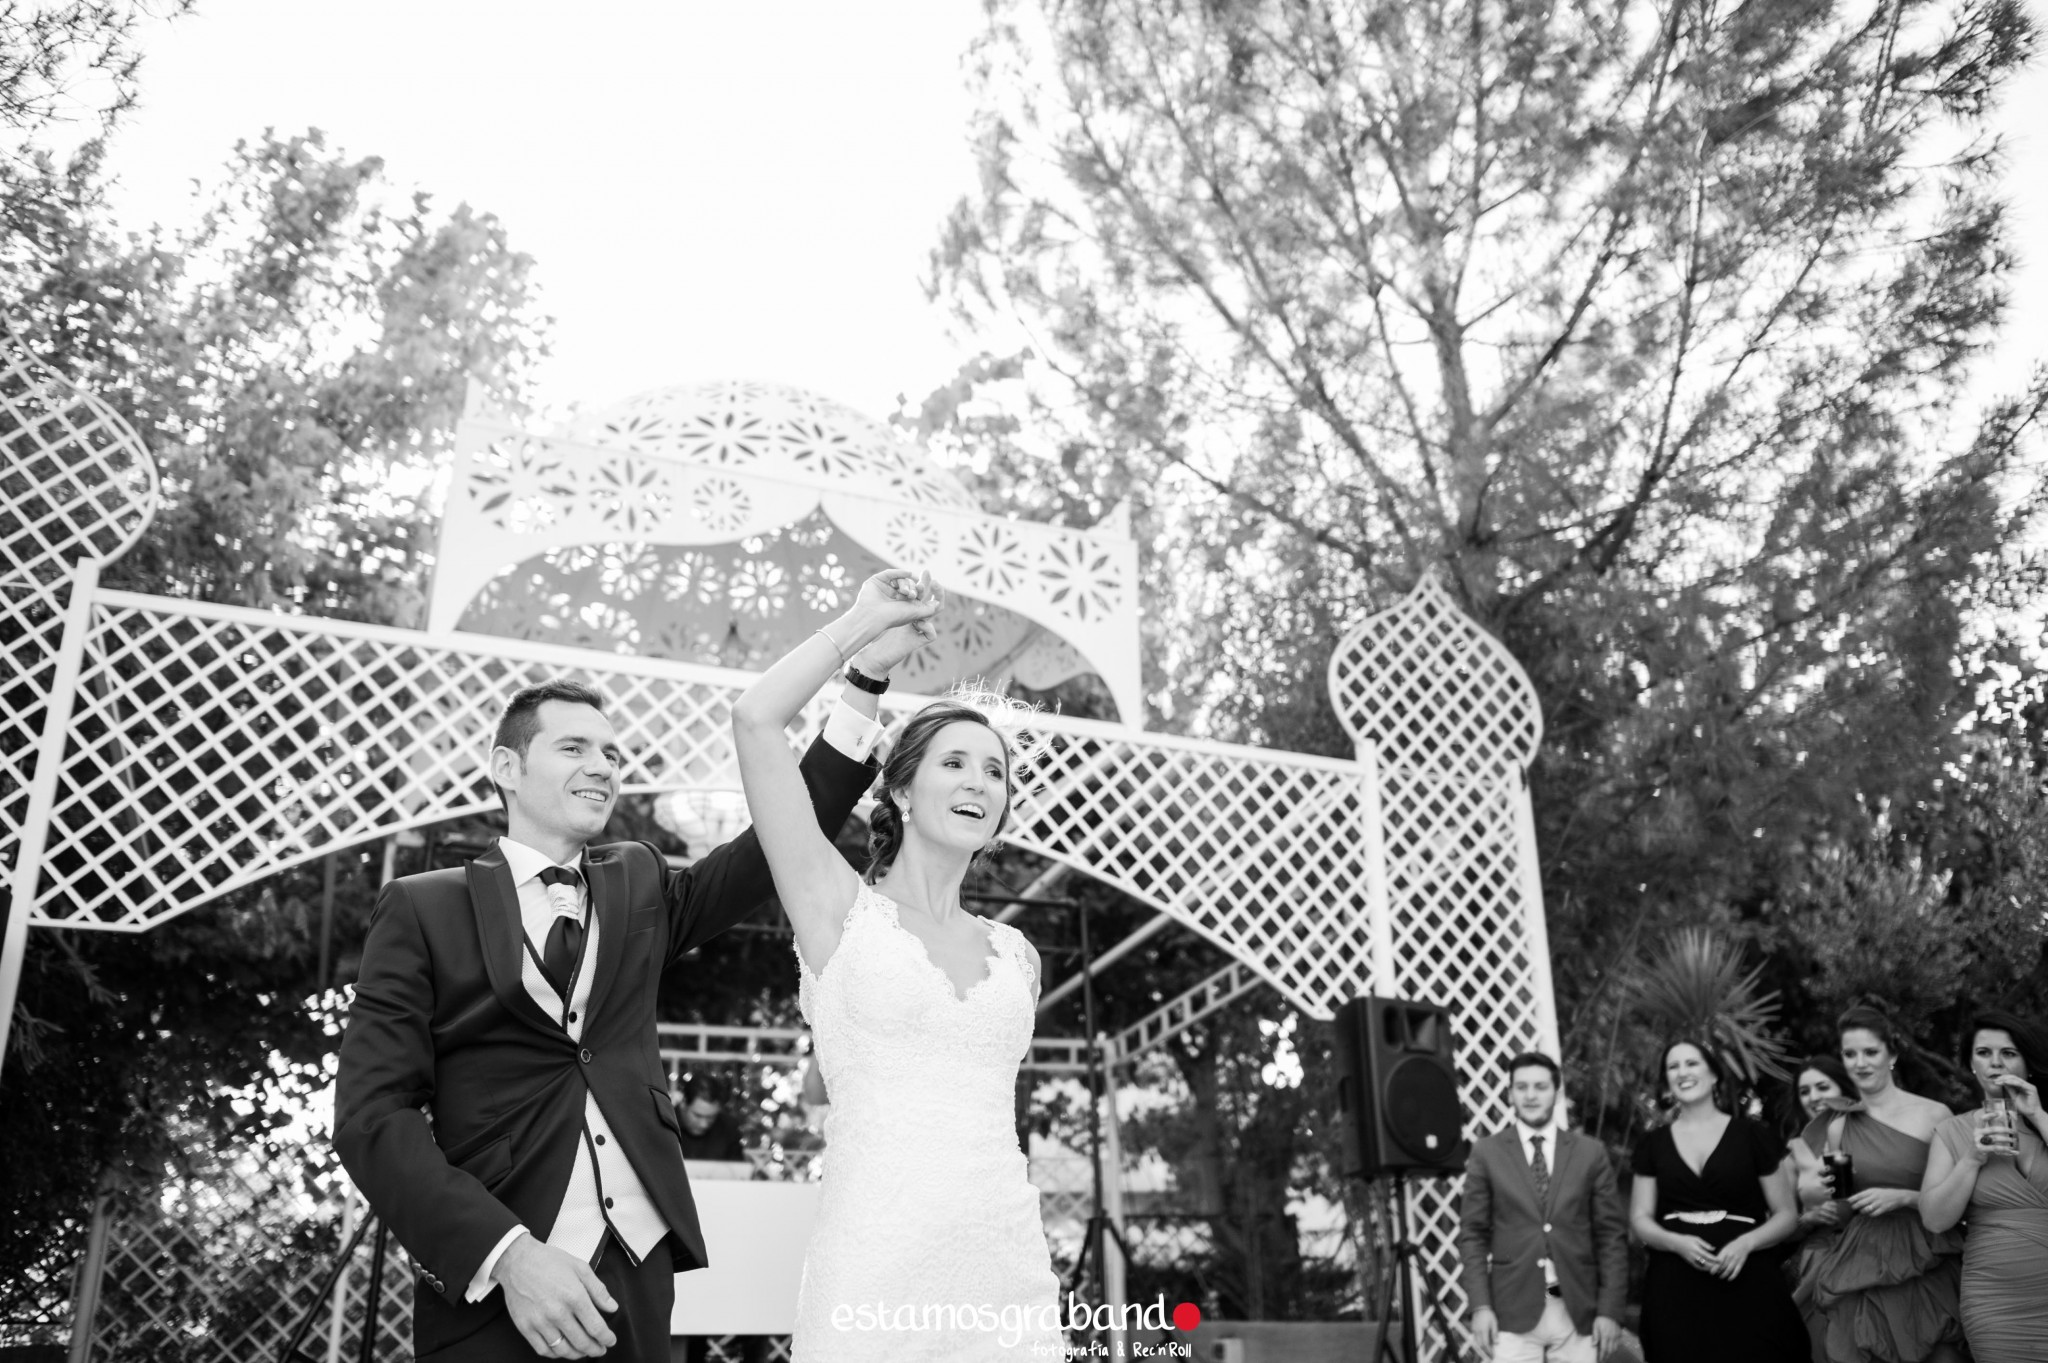 LEO-Y-PEDRO-69 Fotografía de Boda_Leo & Pedro [Jardines de la Mamunia, Granada] - video boda cadiz